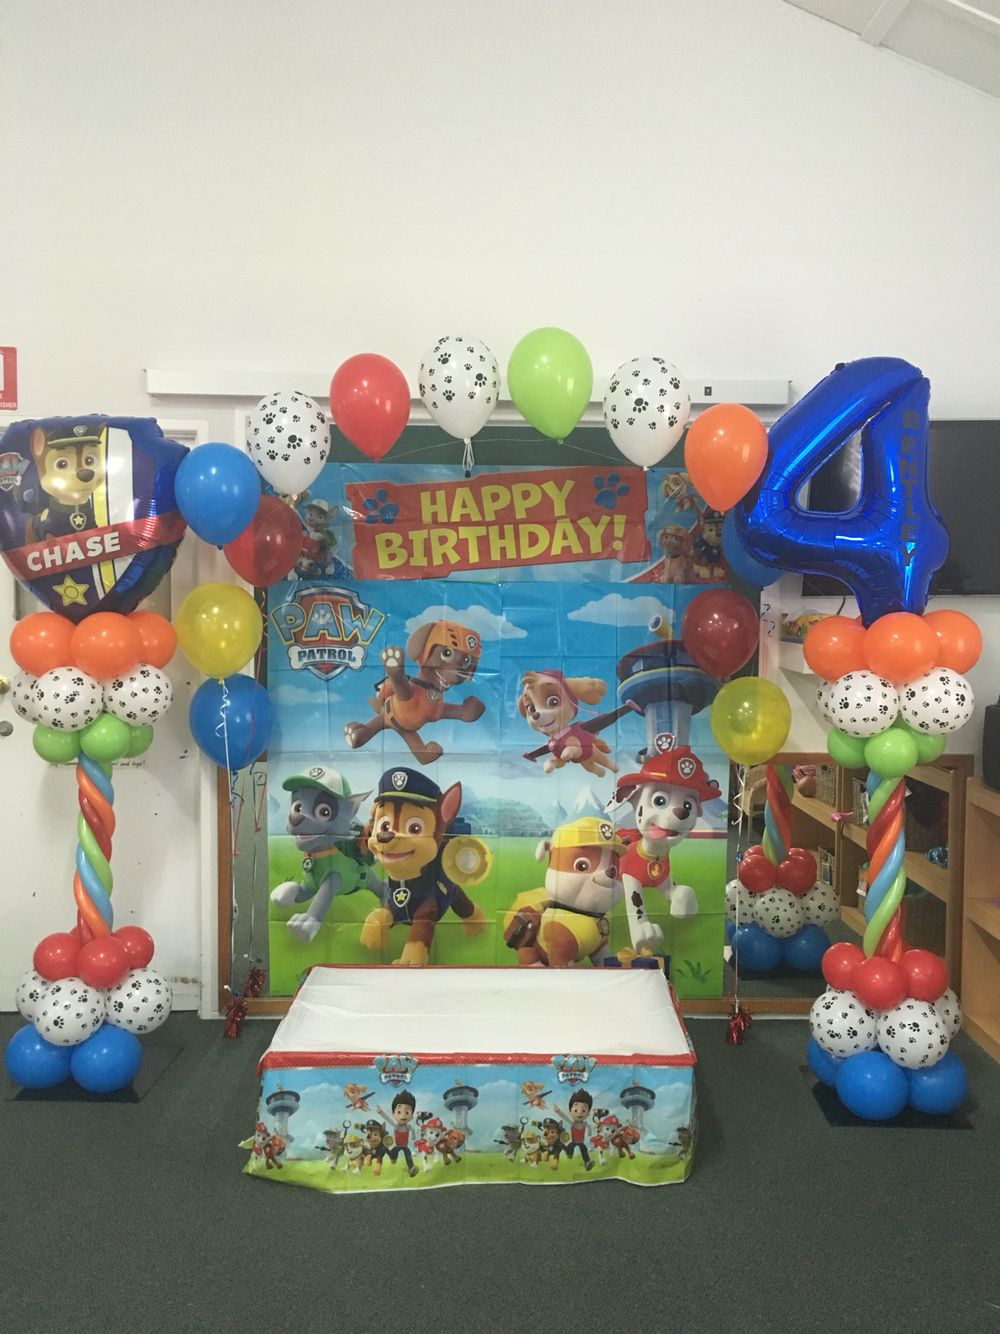 Paw Patrol 4th Birthday Balloon Arch | Party Ideas in 2019 ...